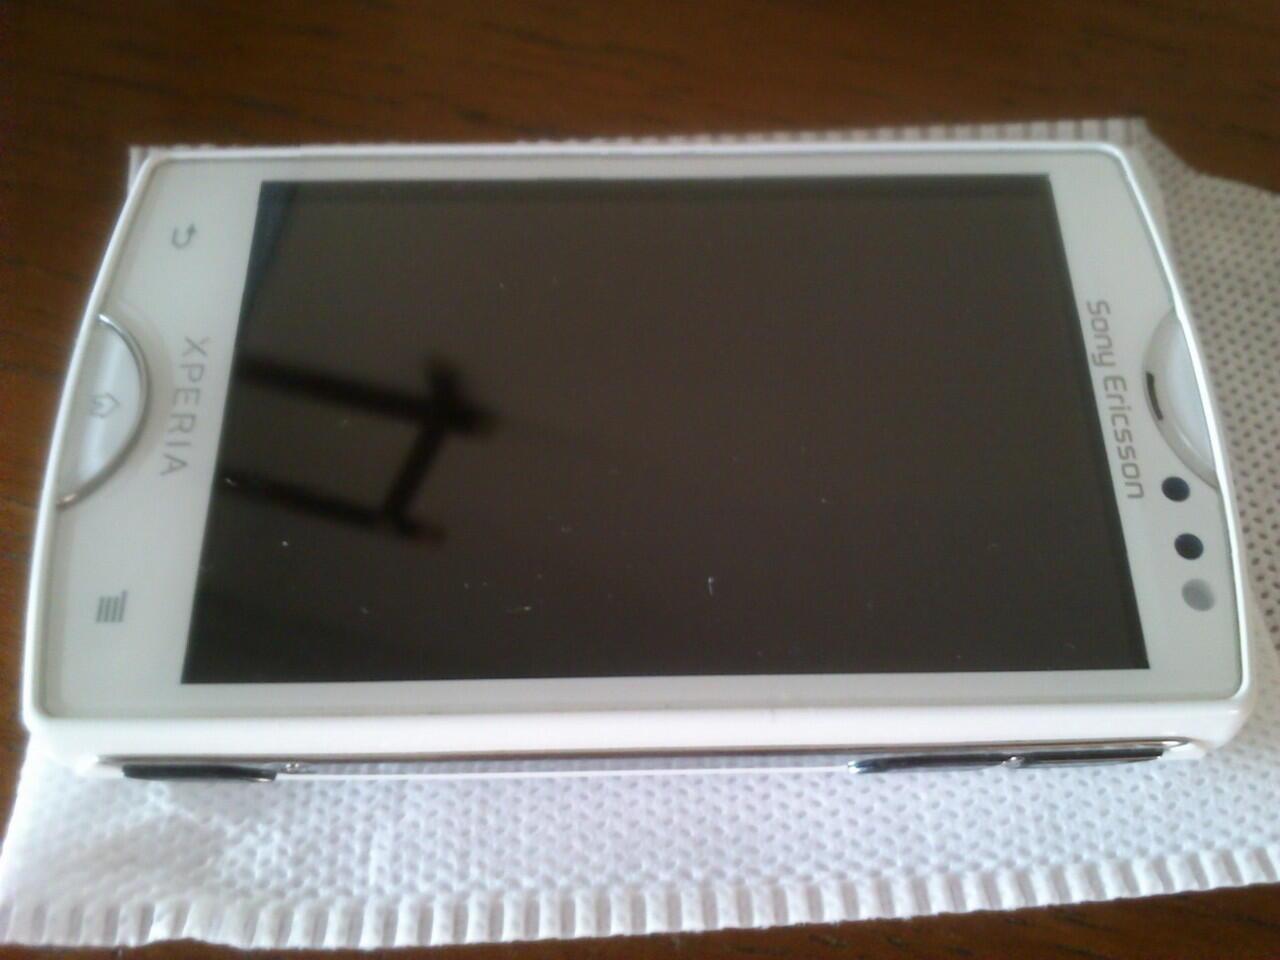 Jual Sony Ericsson ST15i second mulul, khusus Bandung/Cimahi